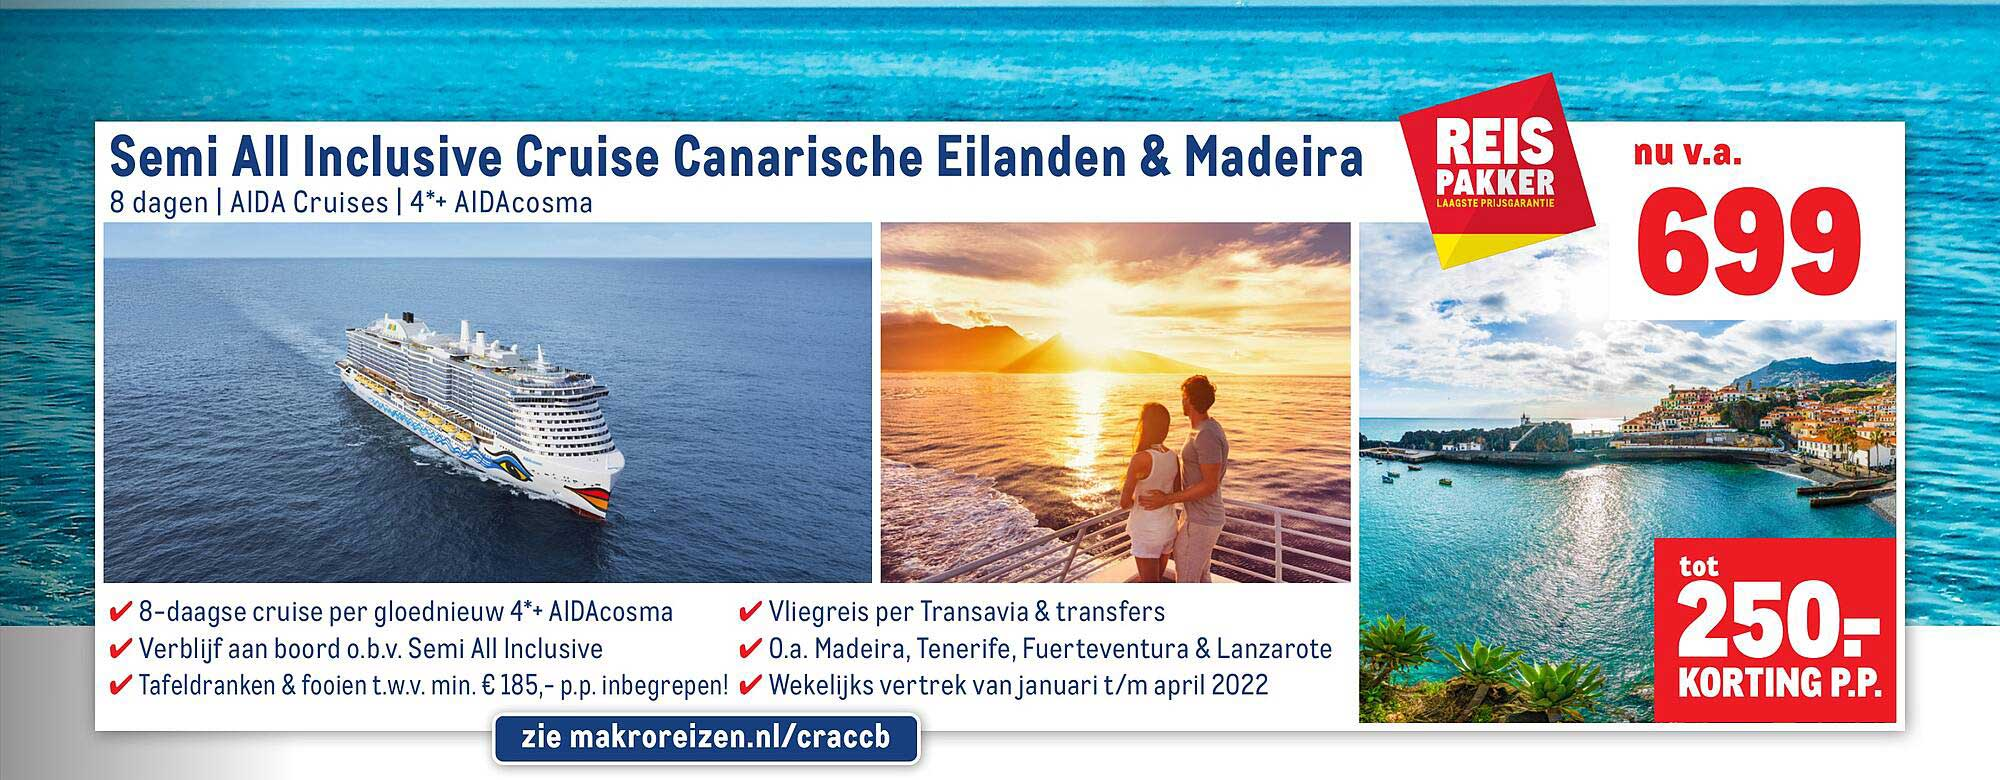 Makro Reizen Semi All Inclusive Cruise Canarische Eilanden & Madeira Tot 250.- Korting